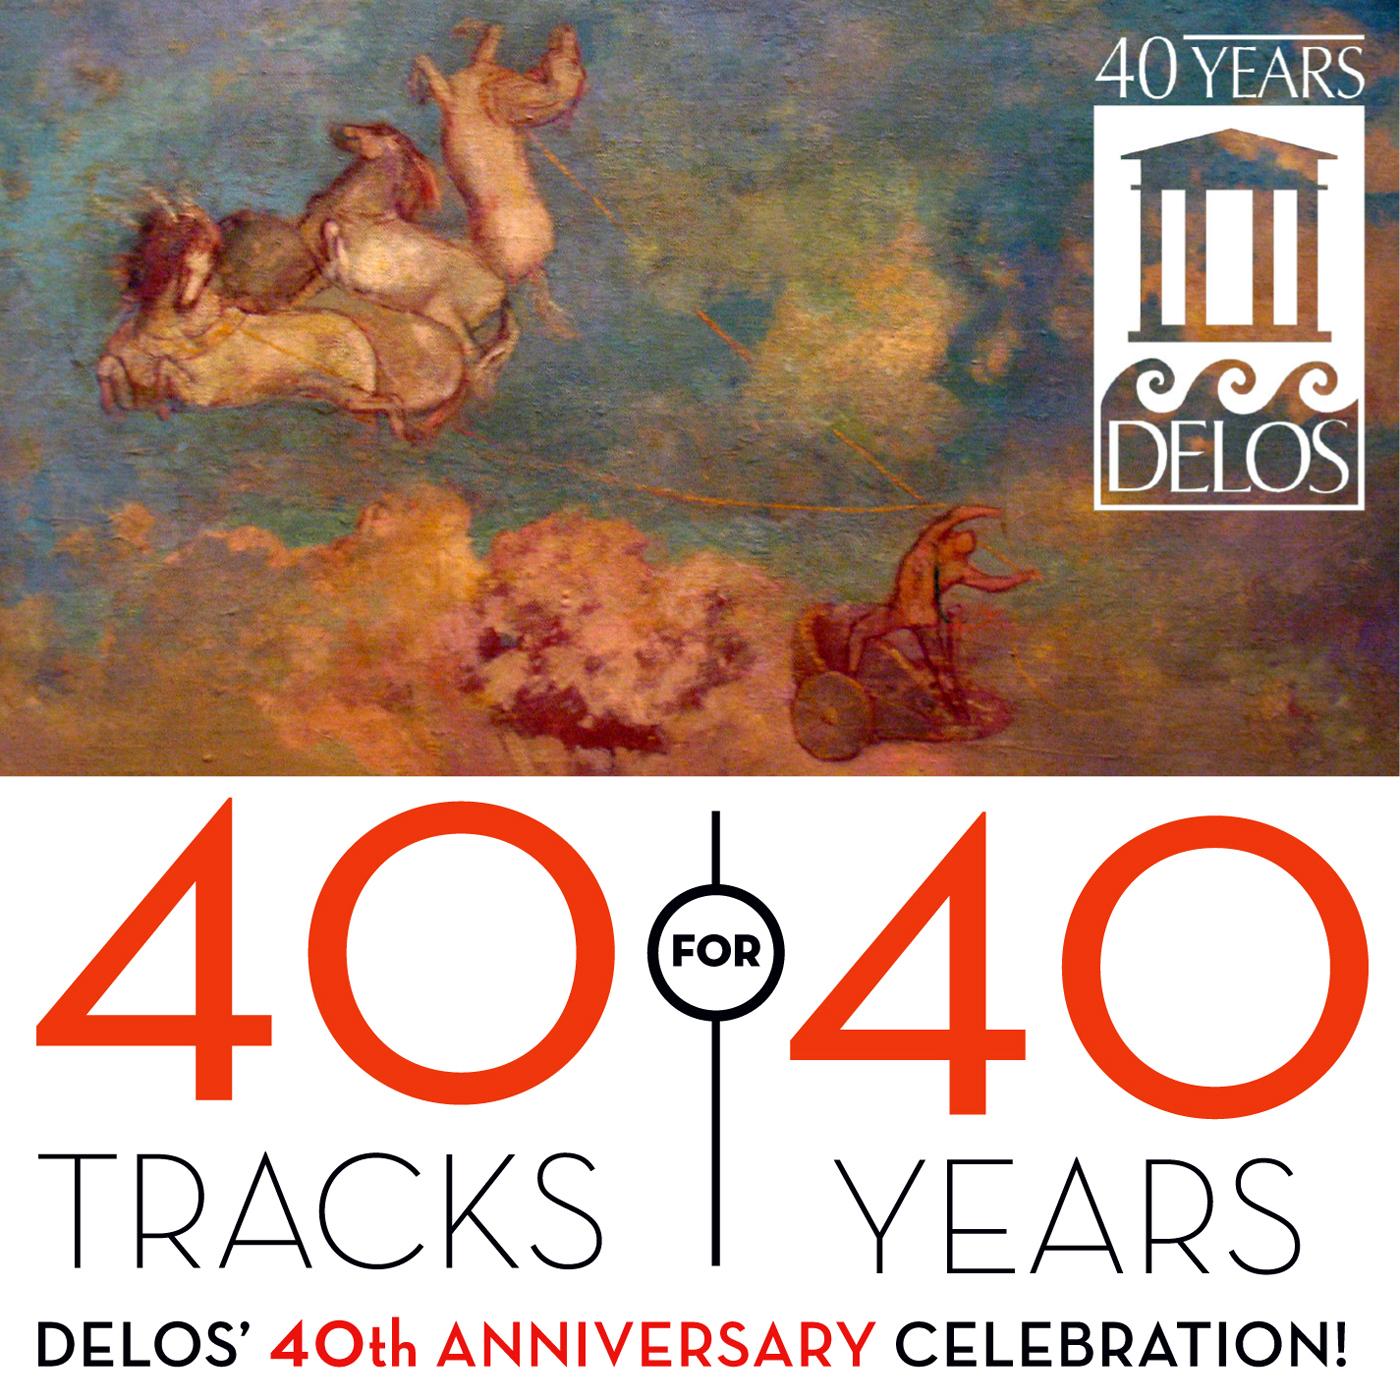 Tracks for years delos th anniversary celebration